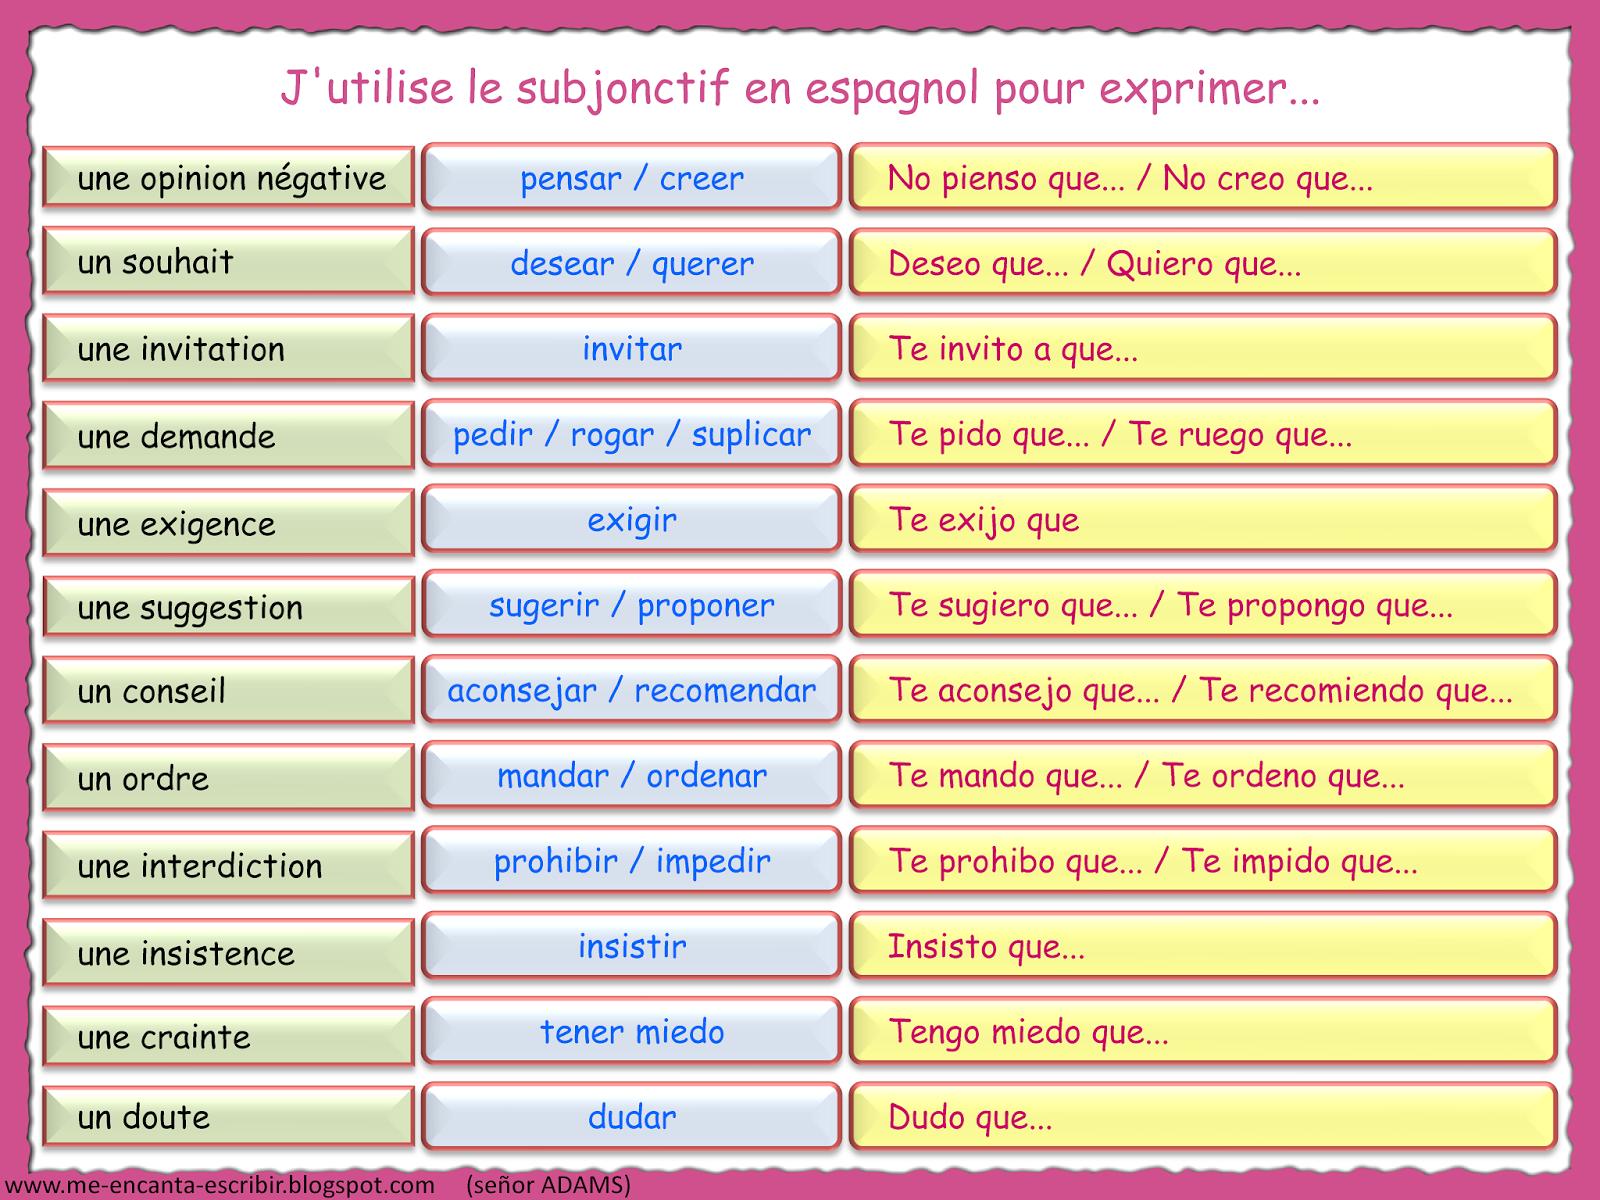 Subjonctif Imparfait en espagnol | Espanhol | Pinterest